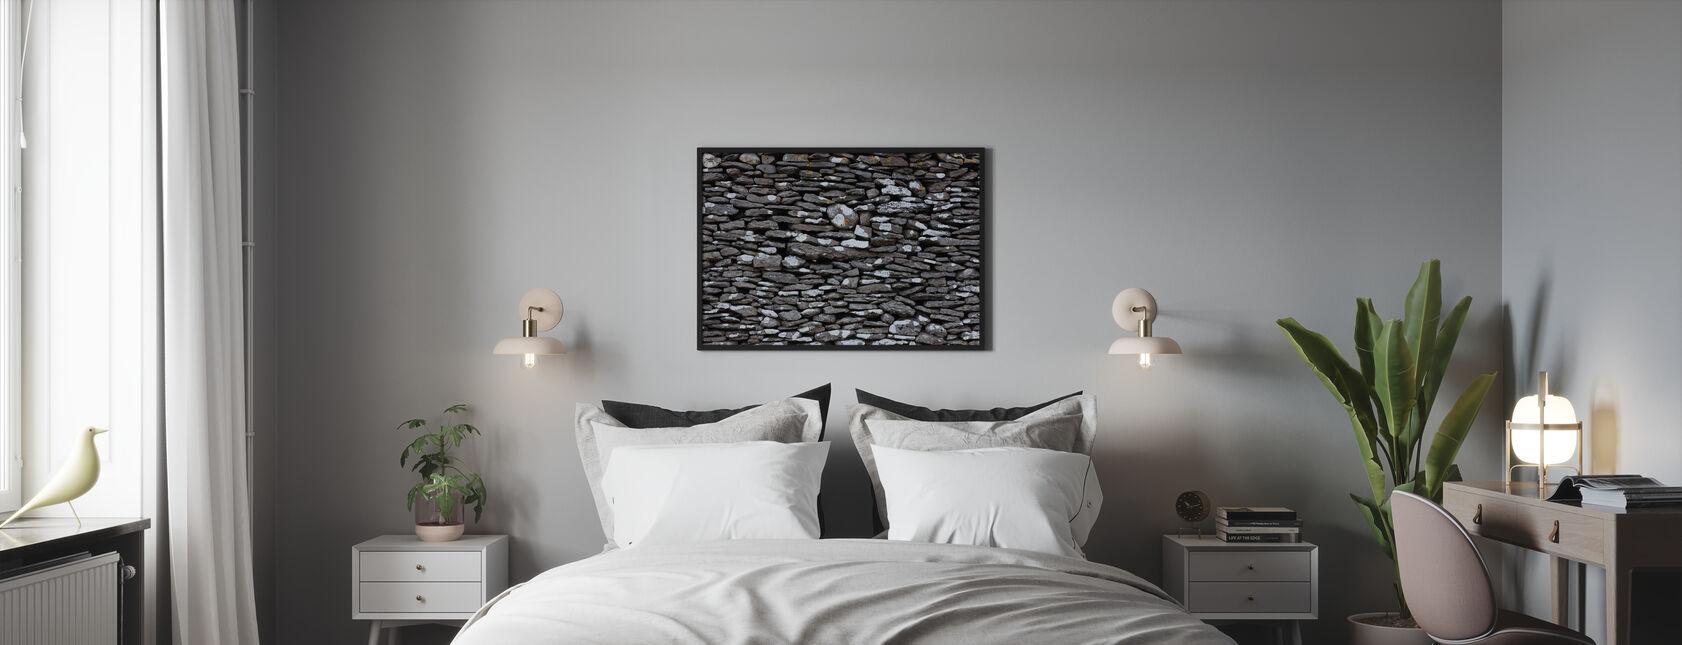 Stenen Muur - Ingelijste print - Slaapkamer